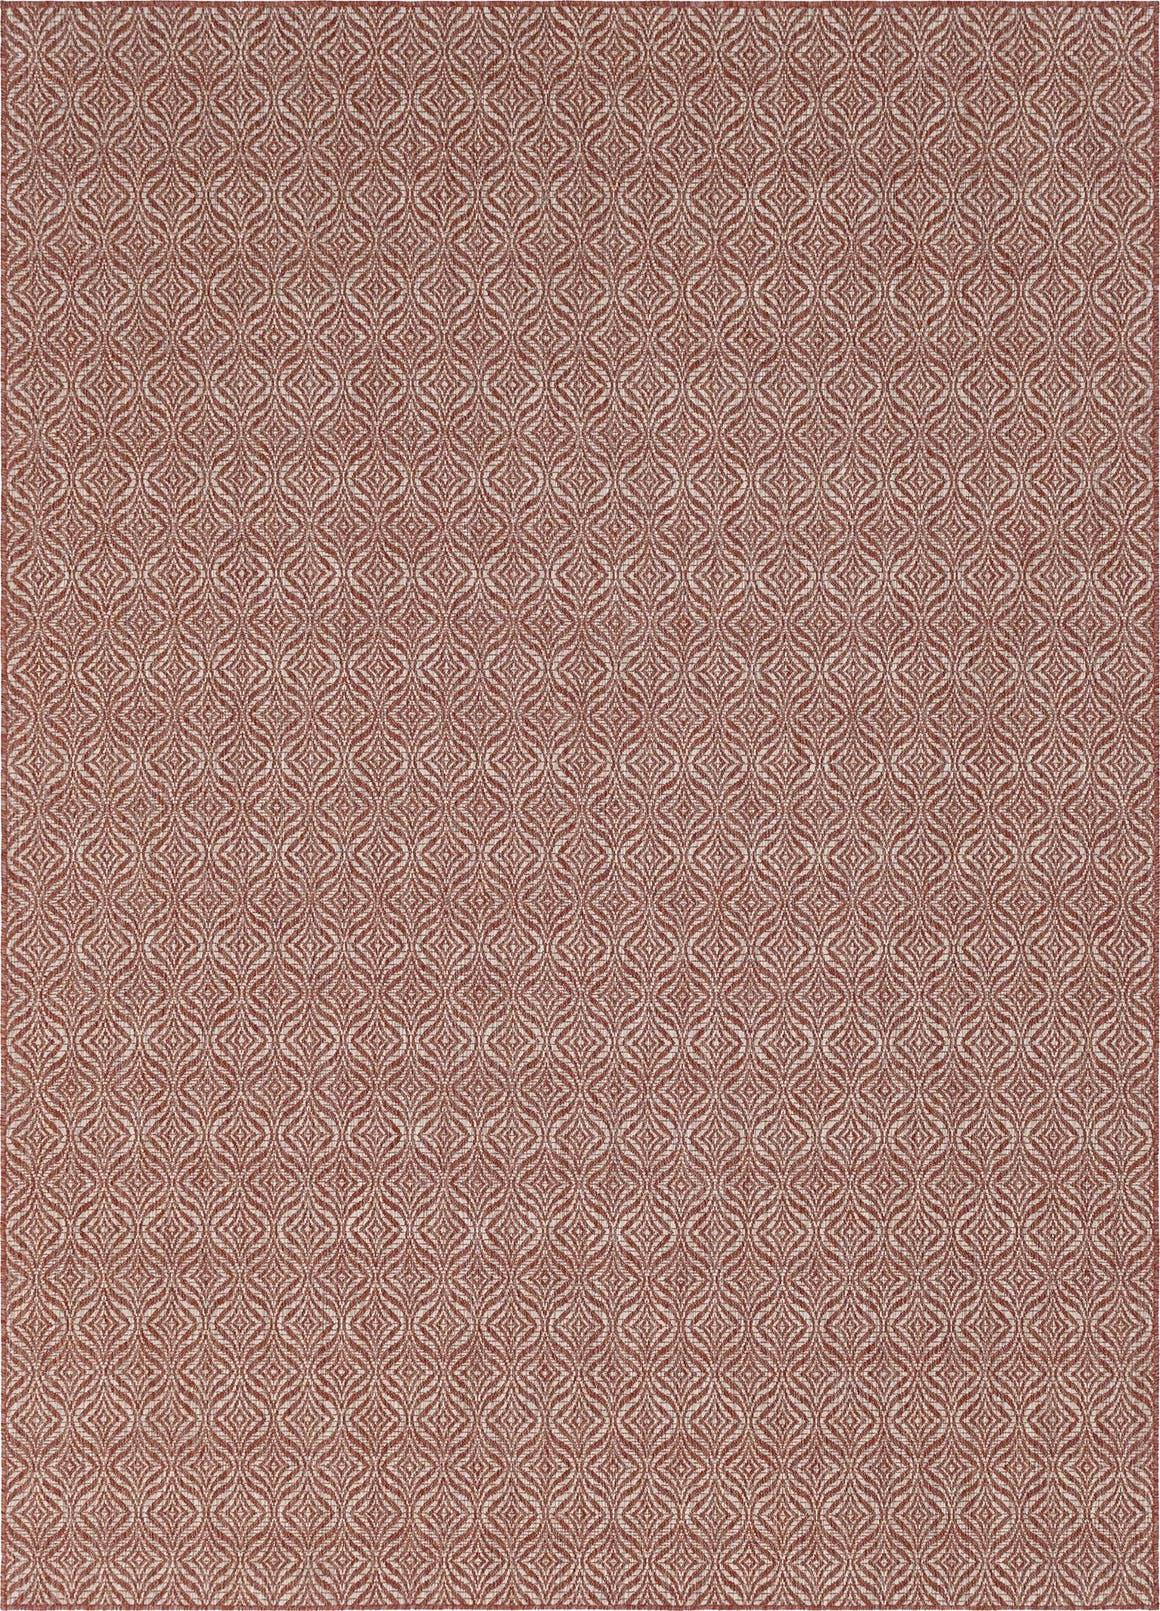 8' x 11' 4 Outdoor Trellis Rug main image